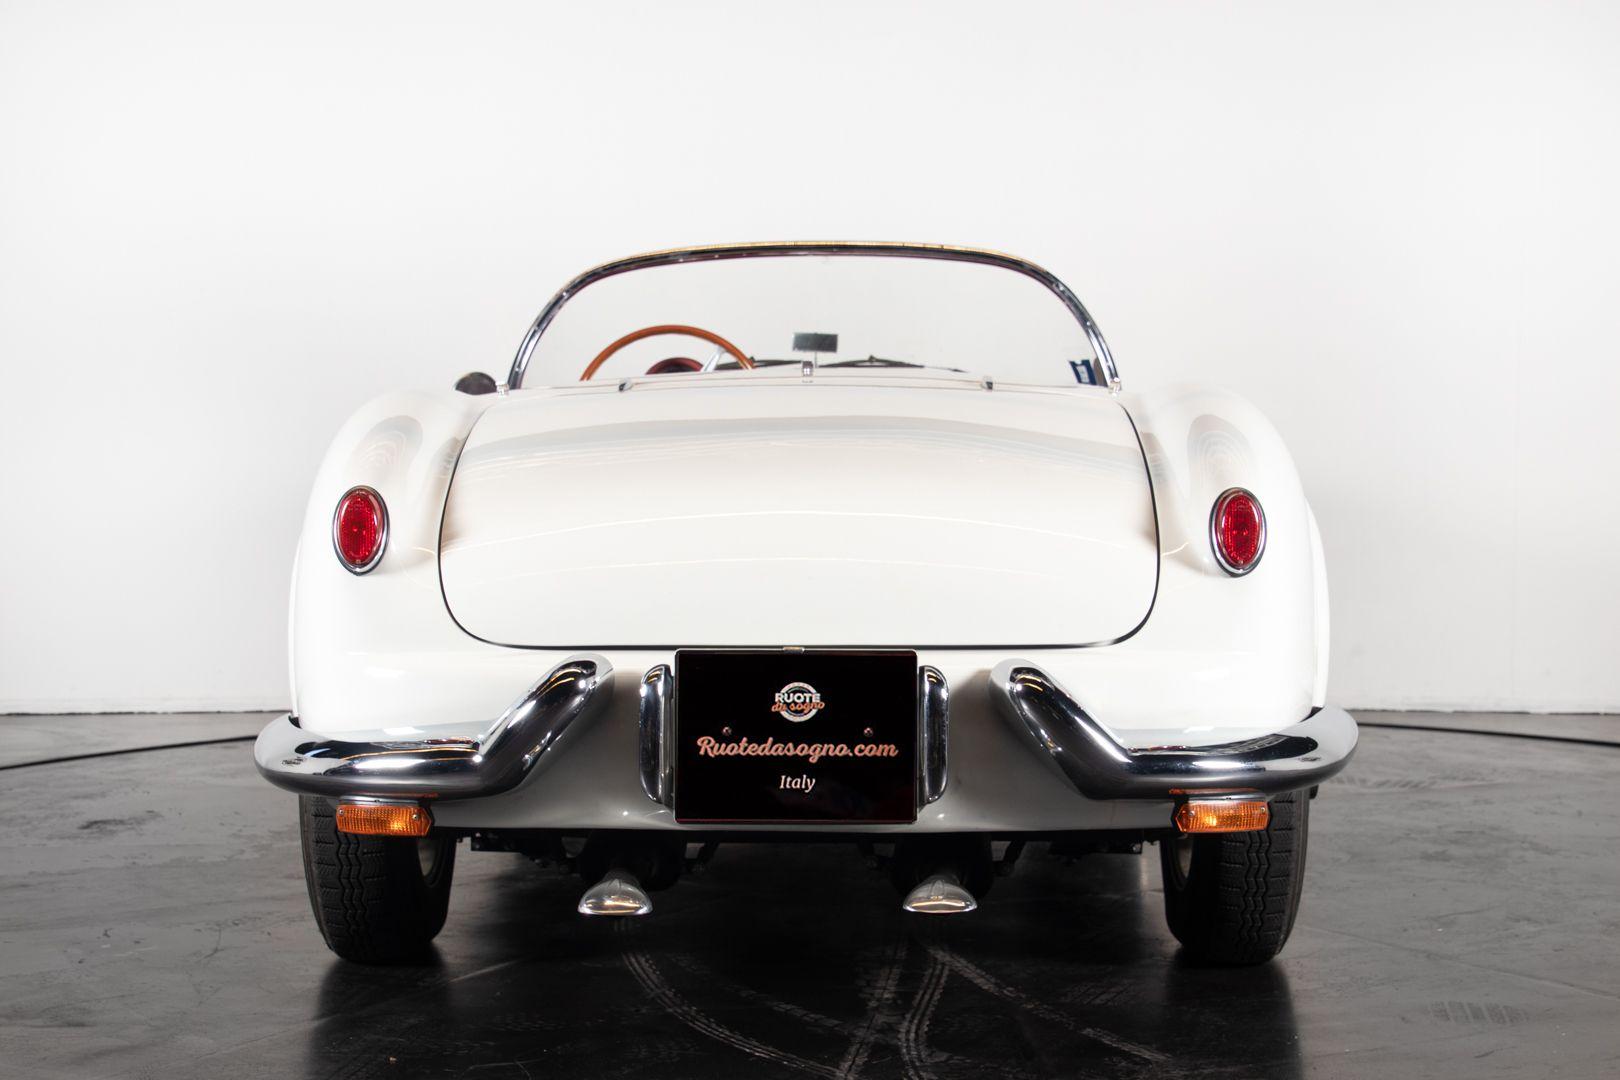 1955 Lancia Aurelia B24 S spider 23204